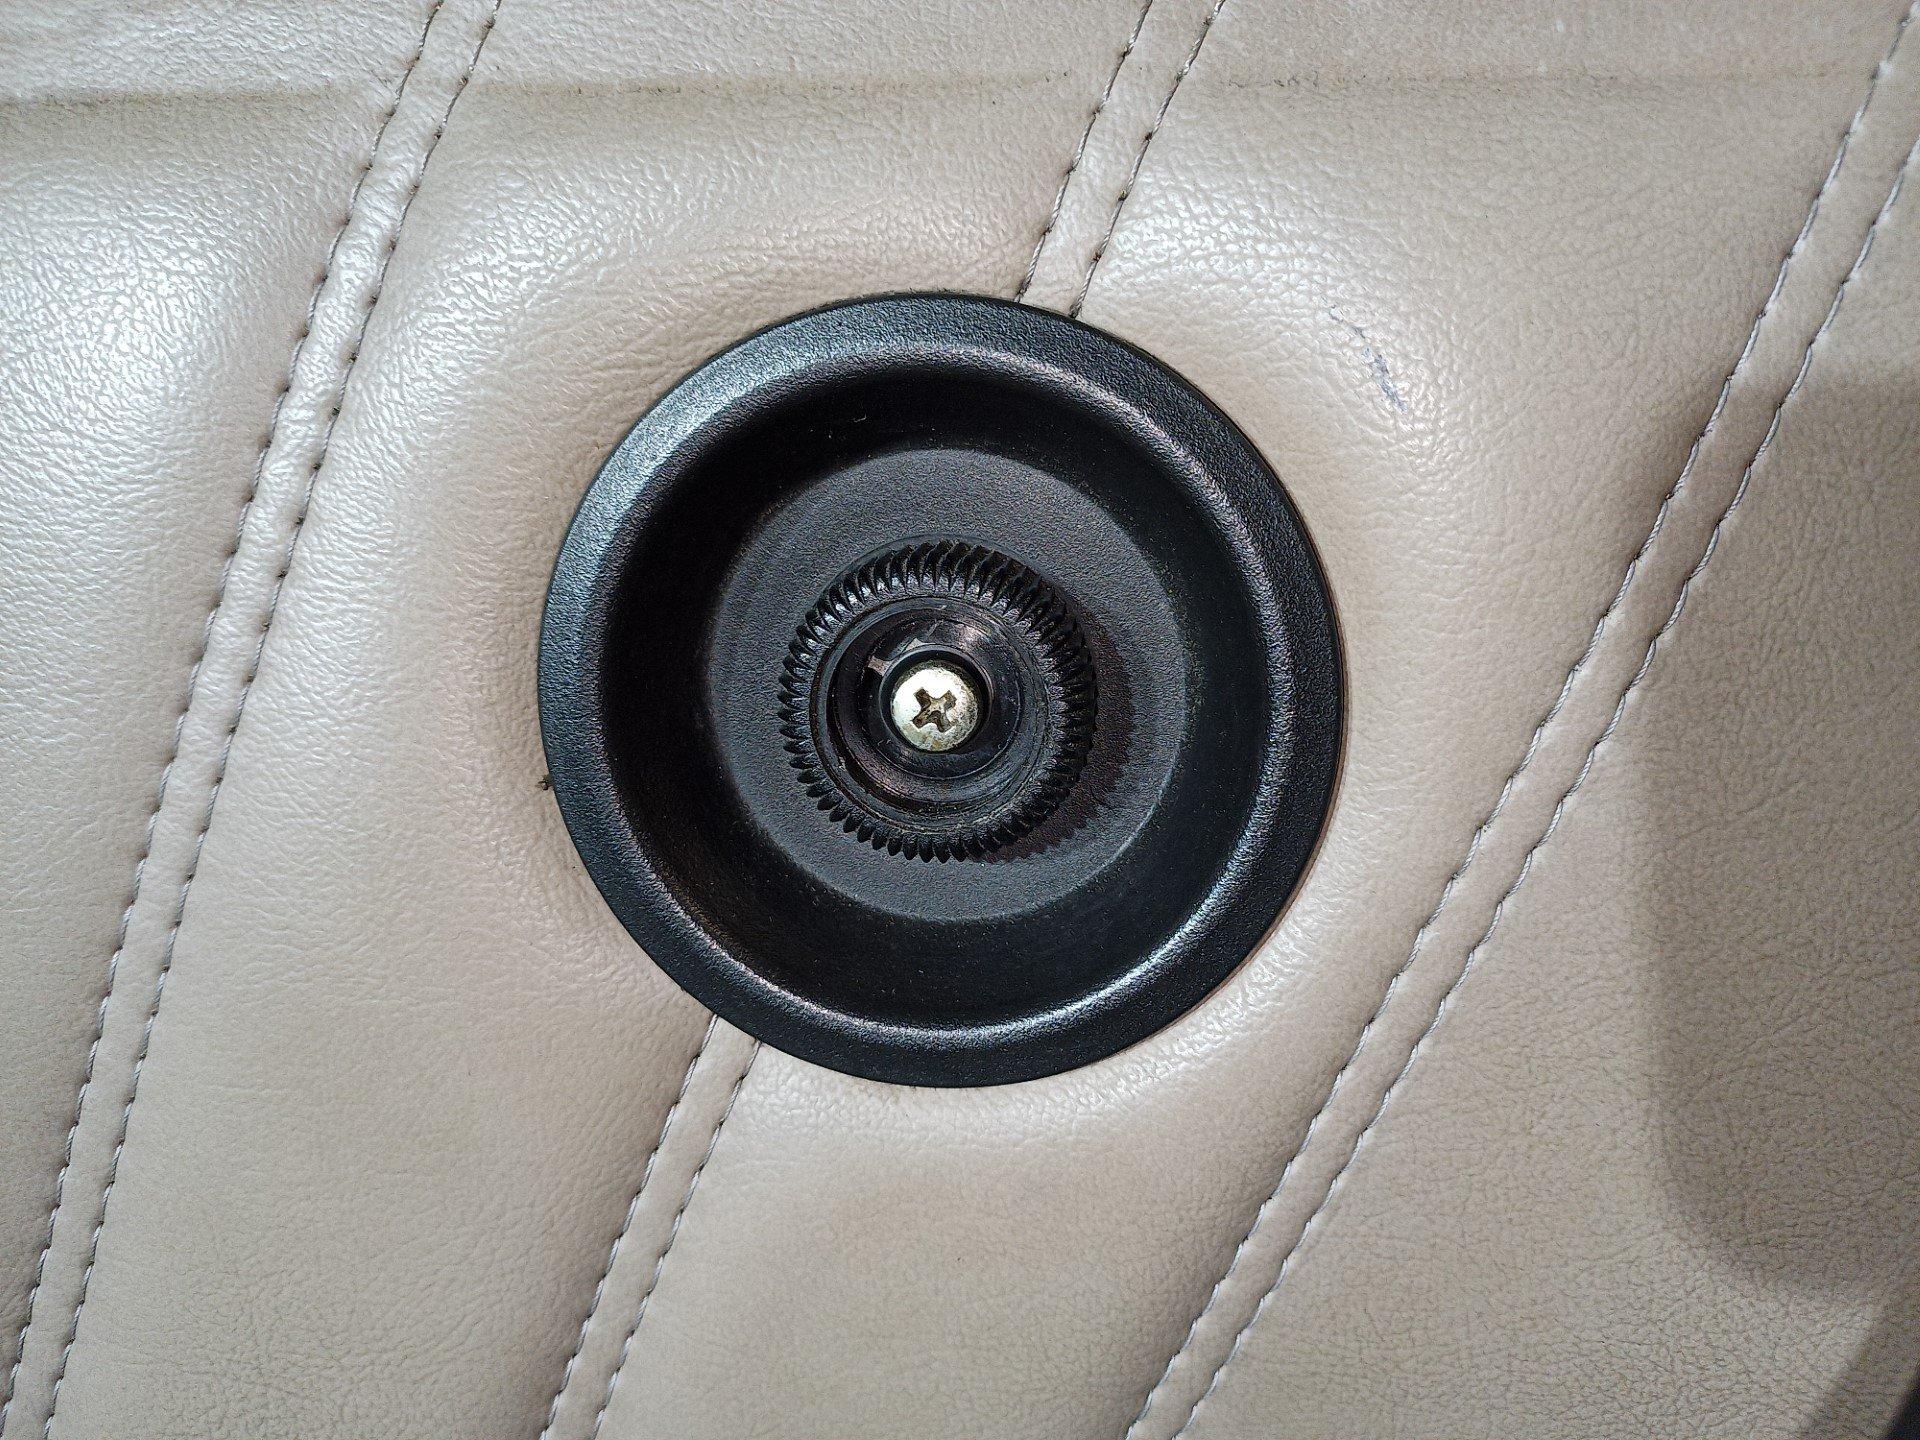 air-cooled porsche 911 door lock knob removal